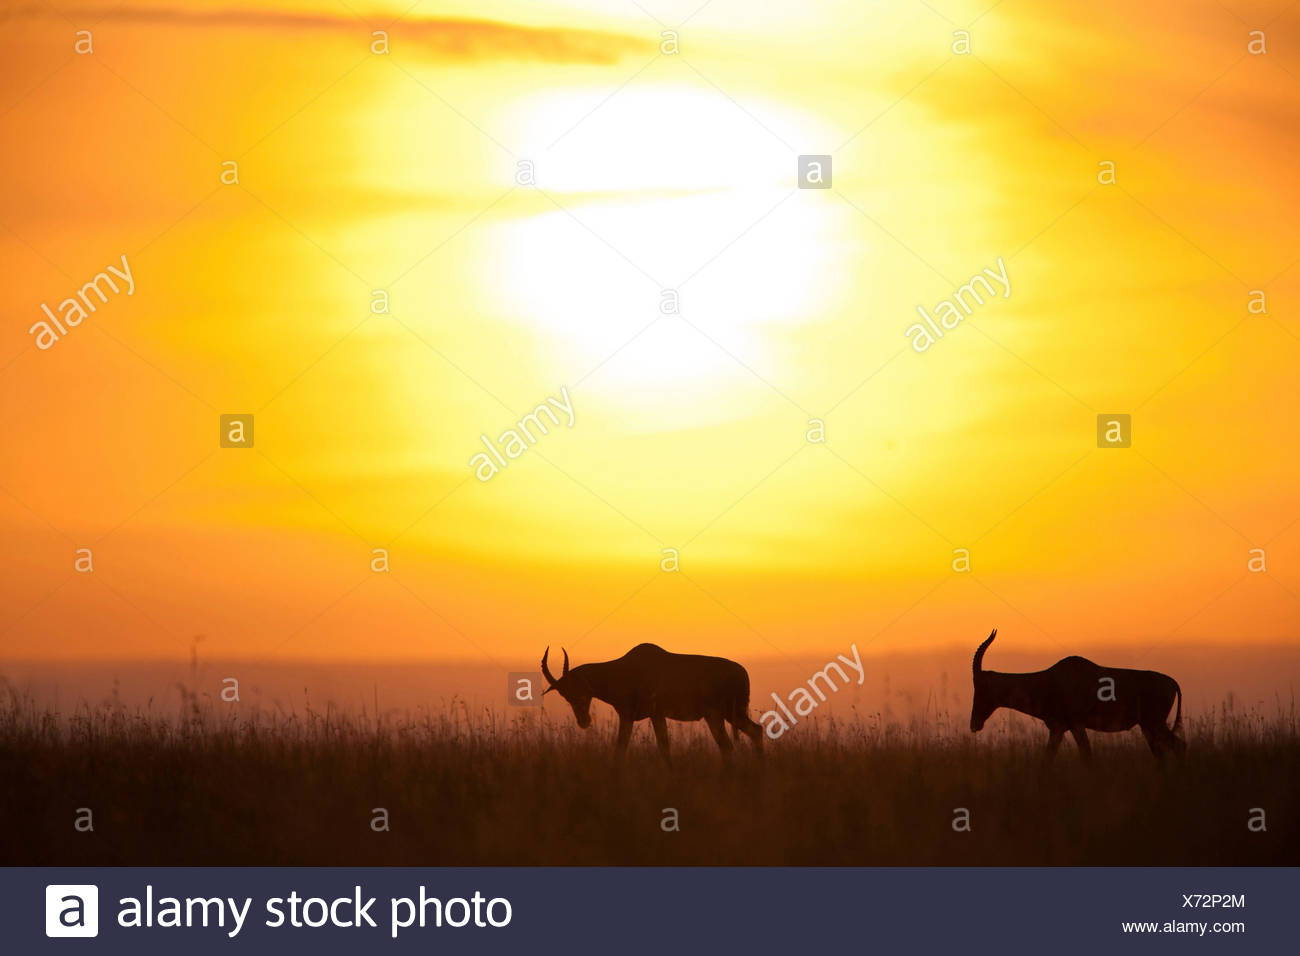 topi, tsessebi, korrigum, tsessebe (Damaliscus lunatus jimela), silhouettes of two topis at sunset, Kenya, Masai Mara National Park - Stock Image